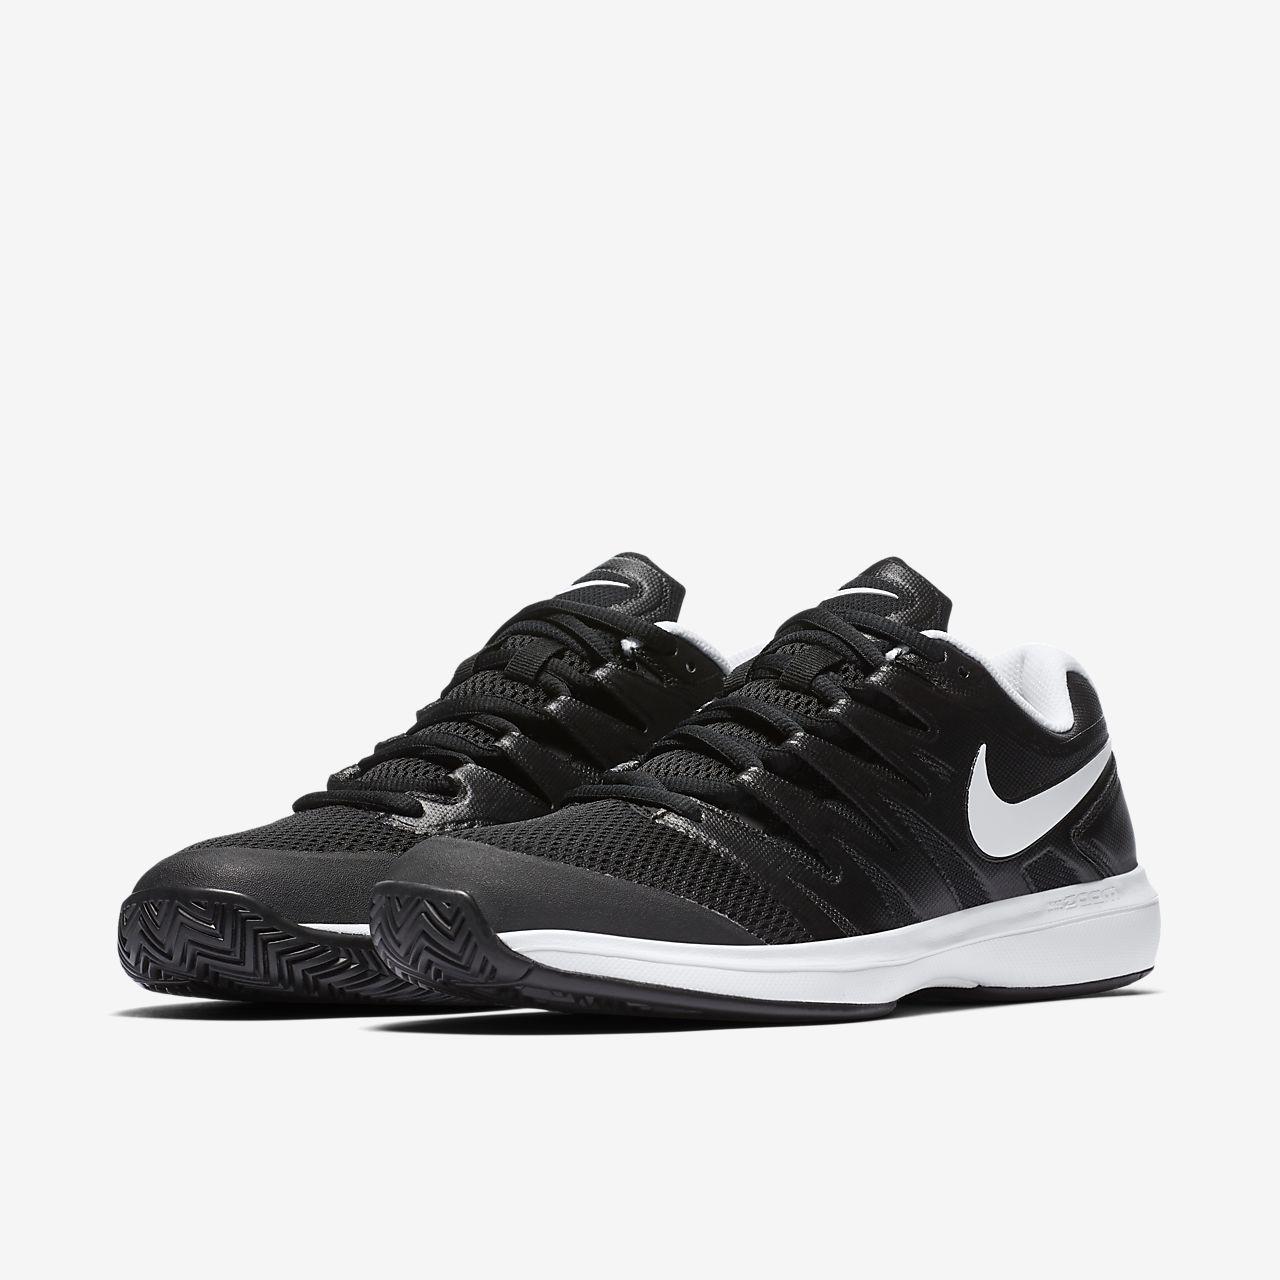 new concept c729a 98685 Tennissko NikeCourt Air Zoom Prestige Hard Court för män. Nike.com SE